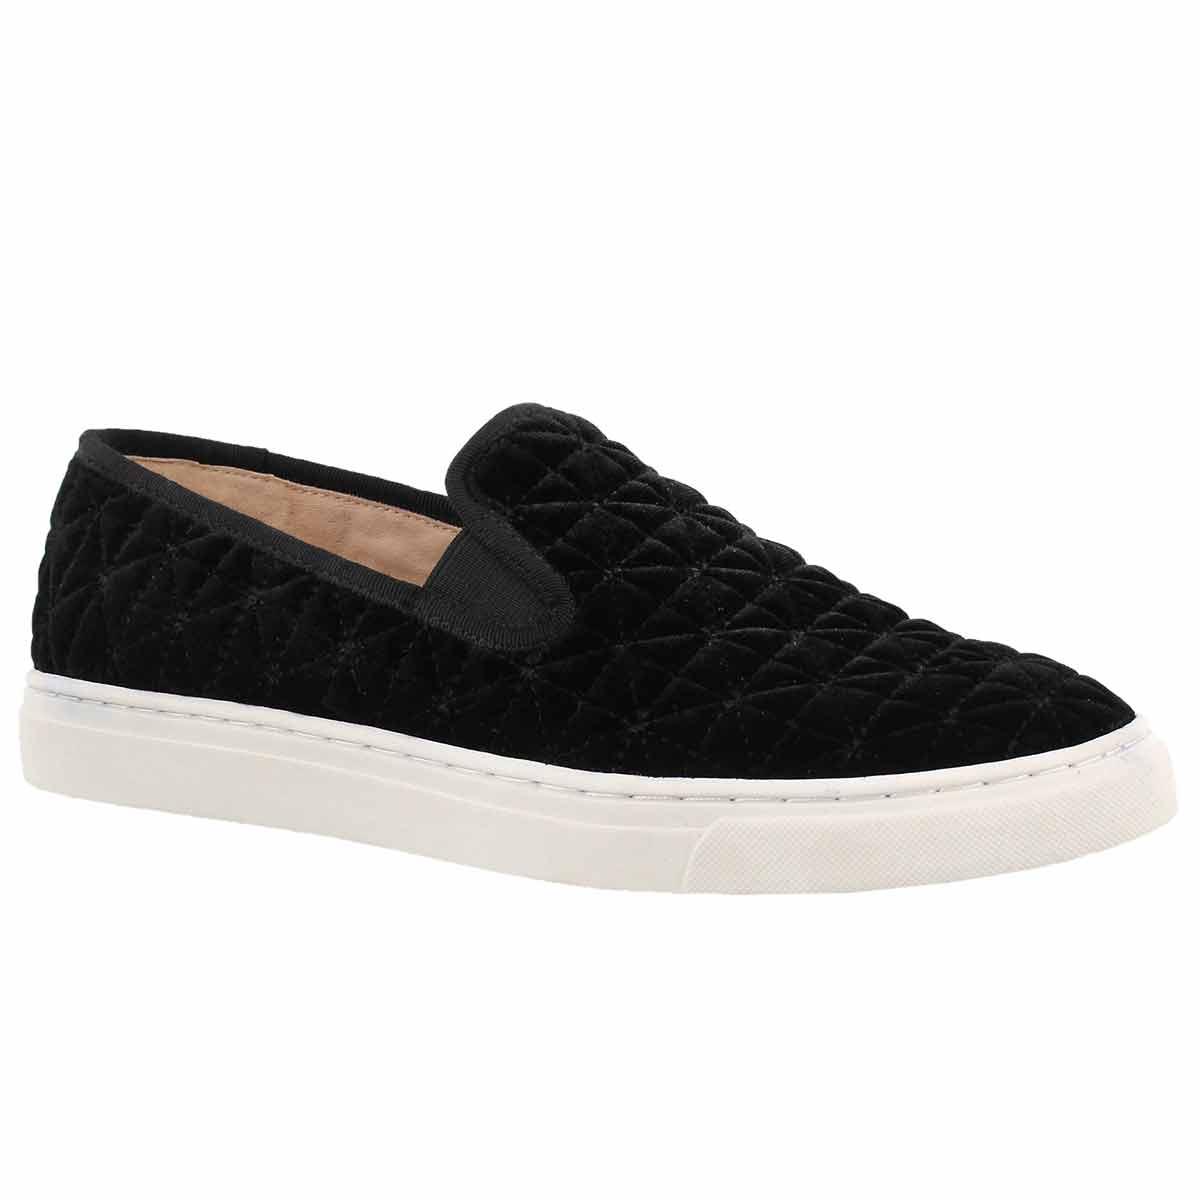 Women's BILLENA black casual slip on shoes